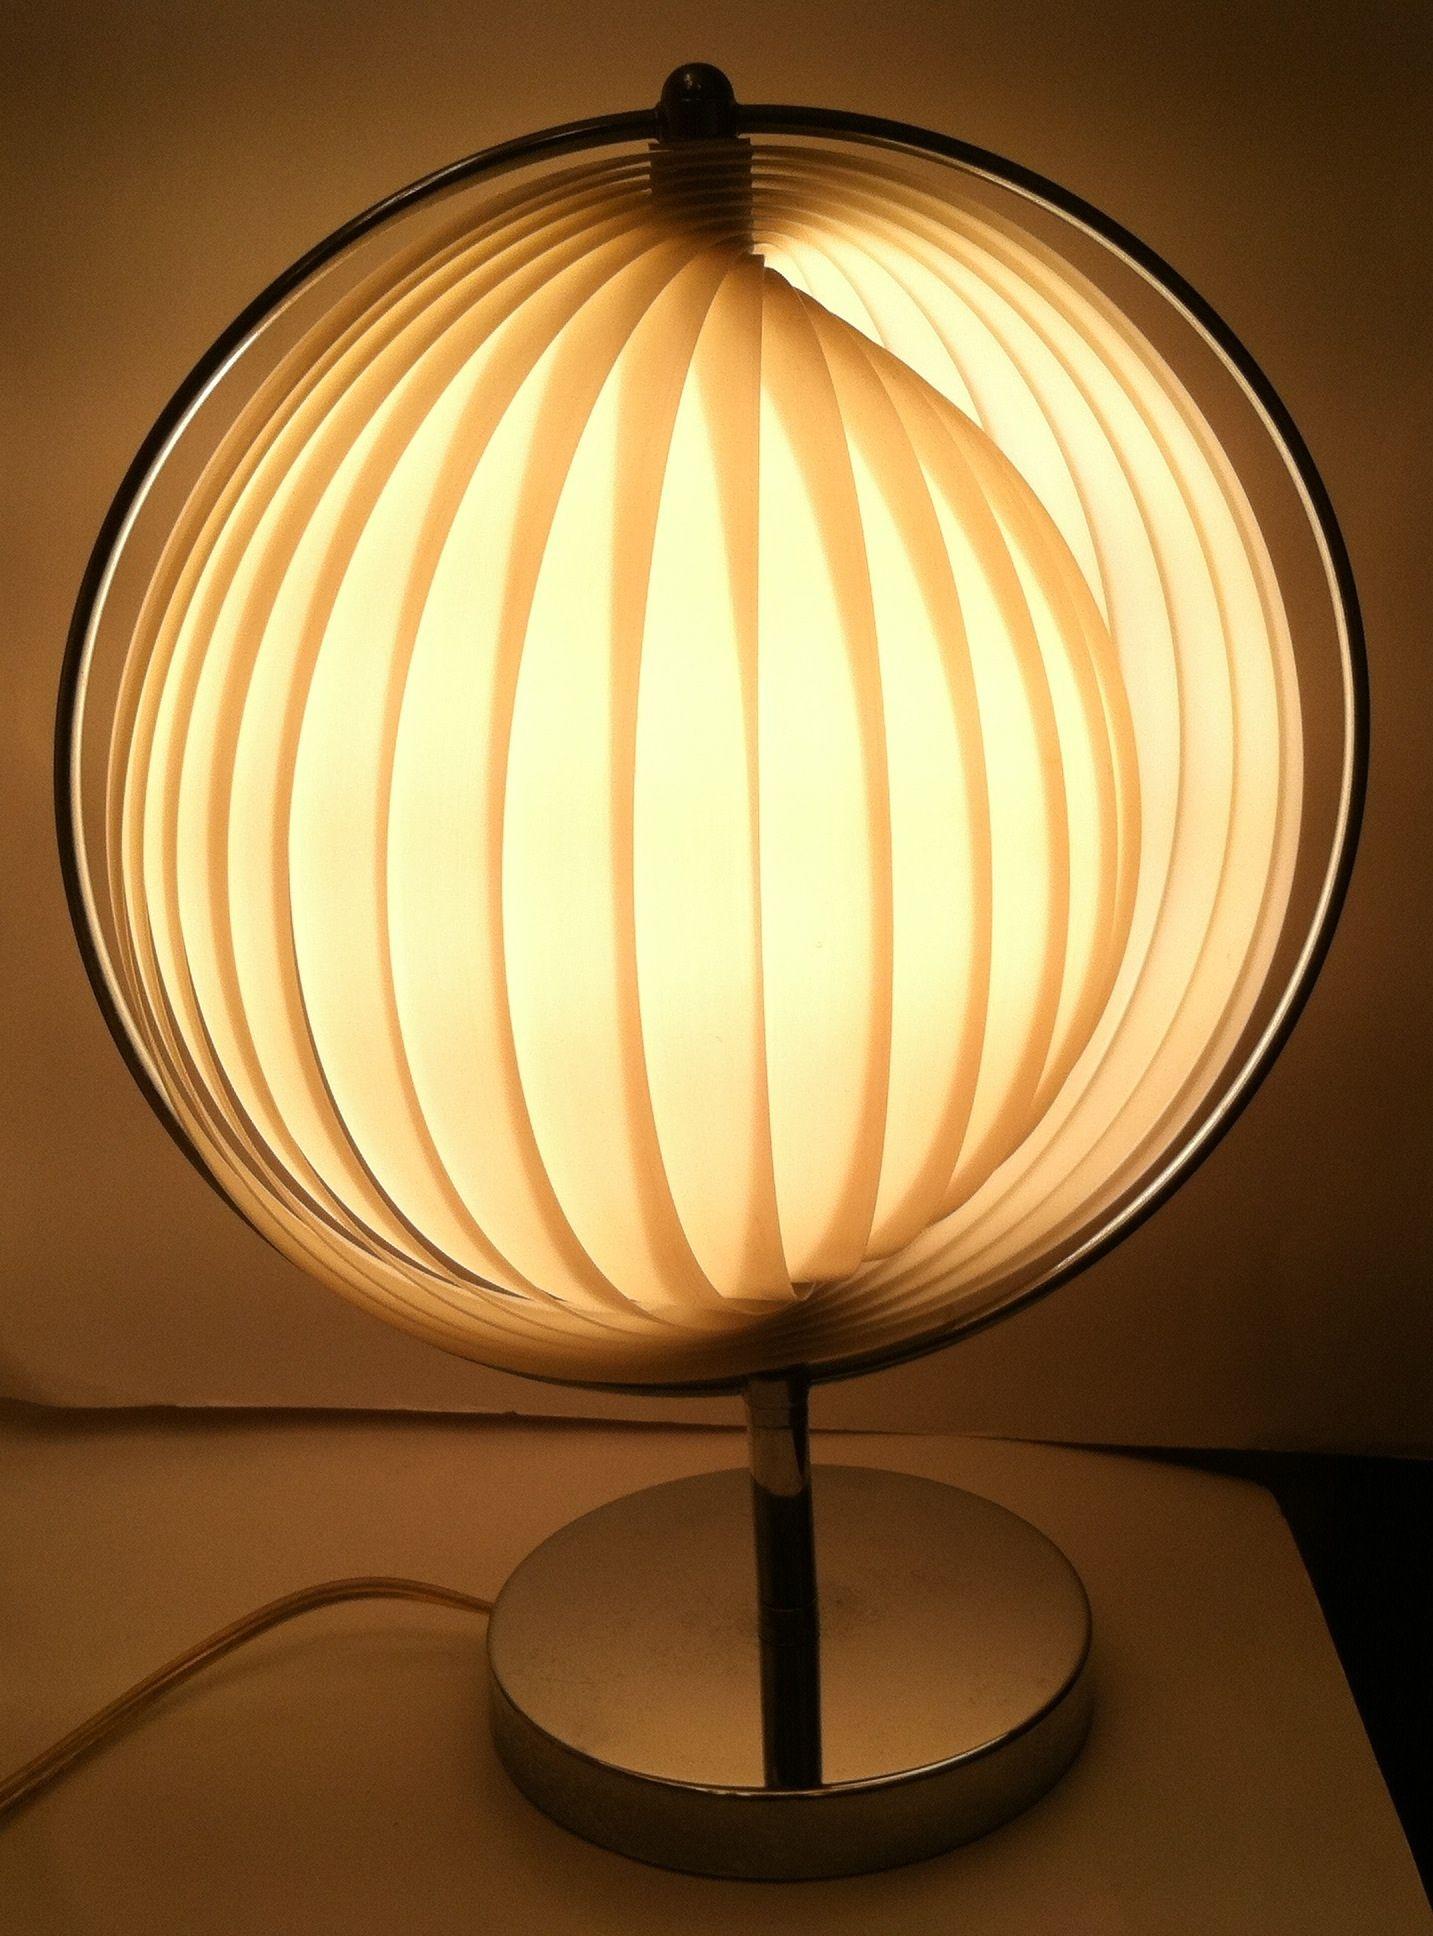 Verner panton moon lamp  antique appraisal   InstAppraisal